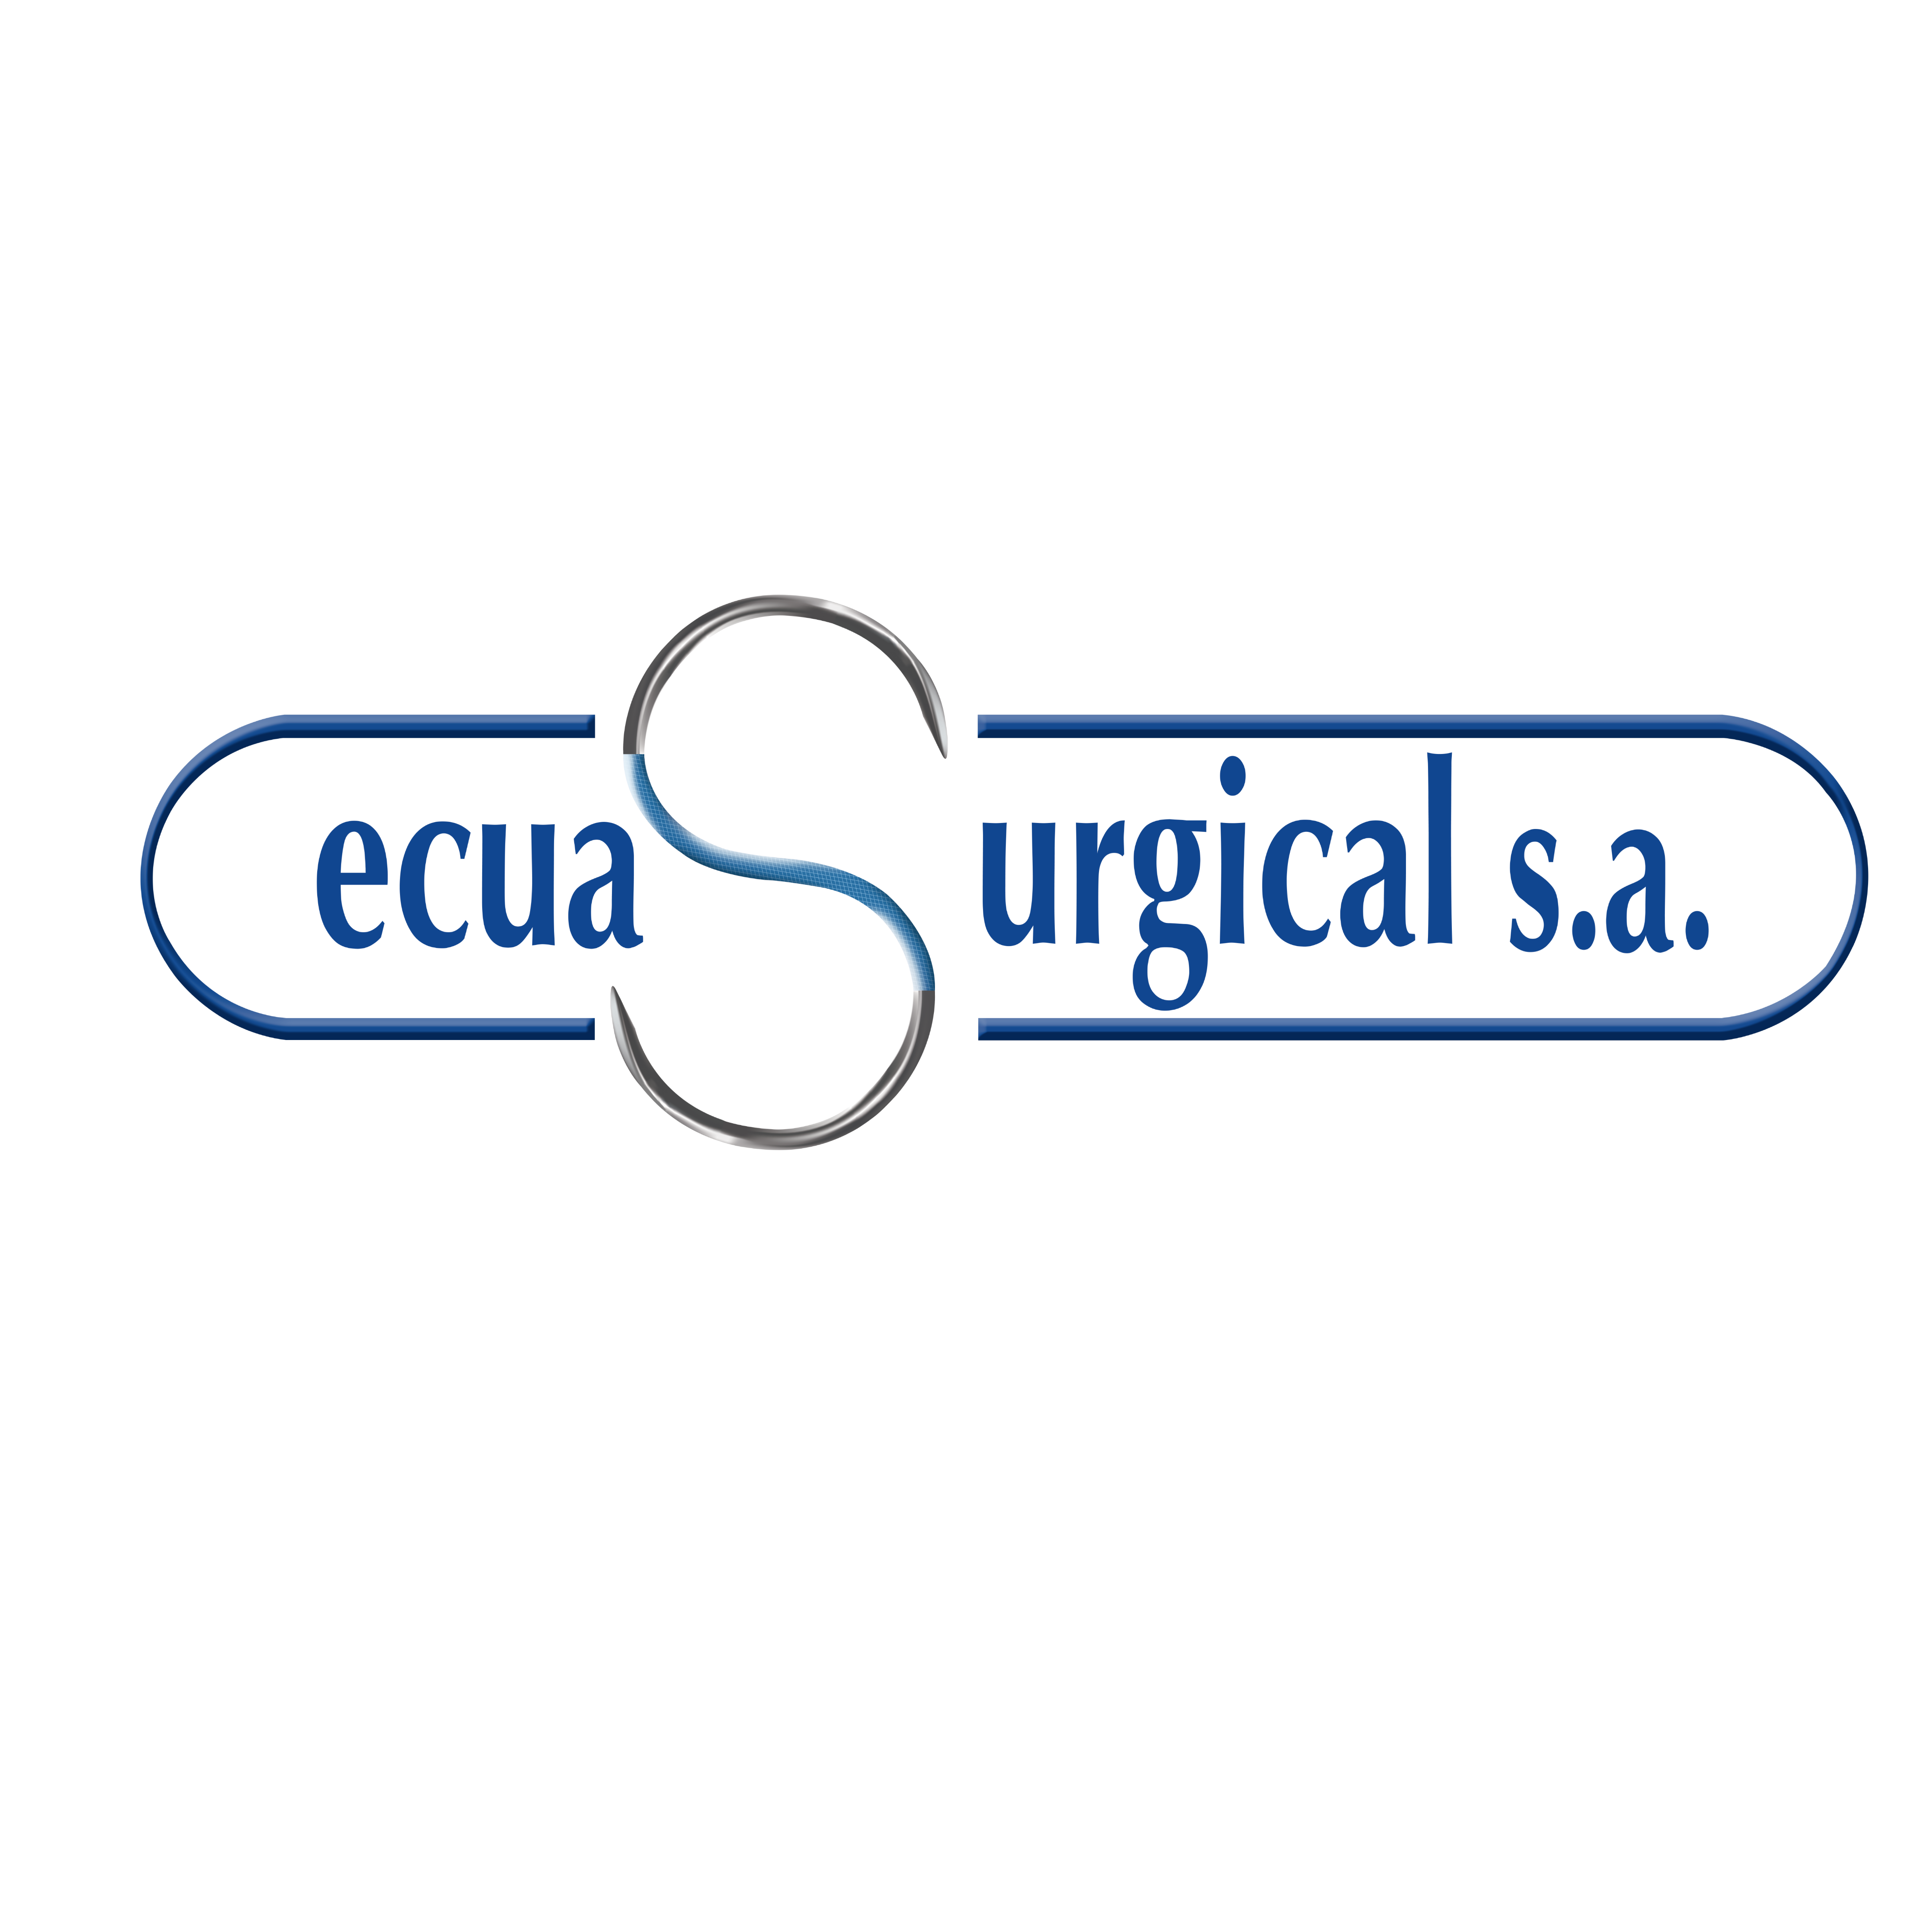 Ecuasurgical